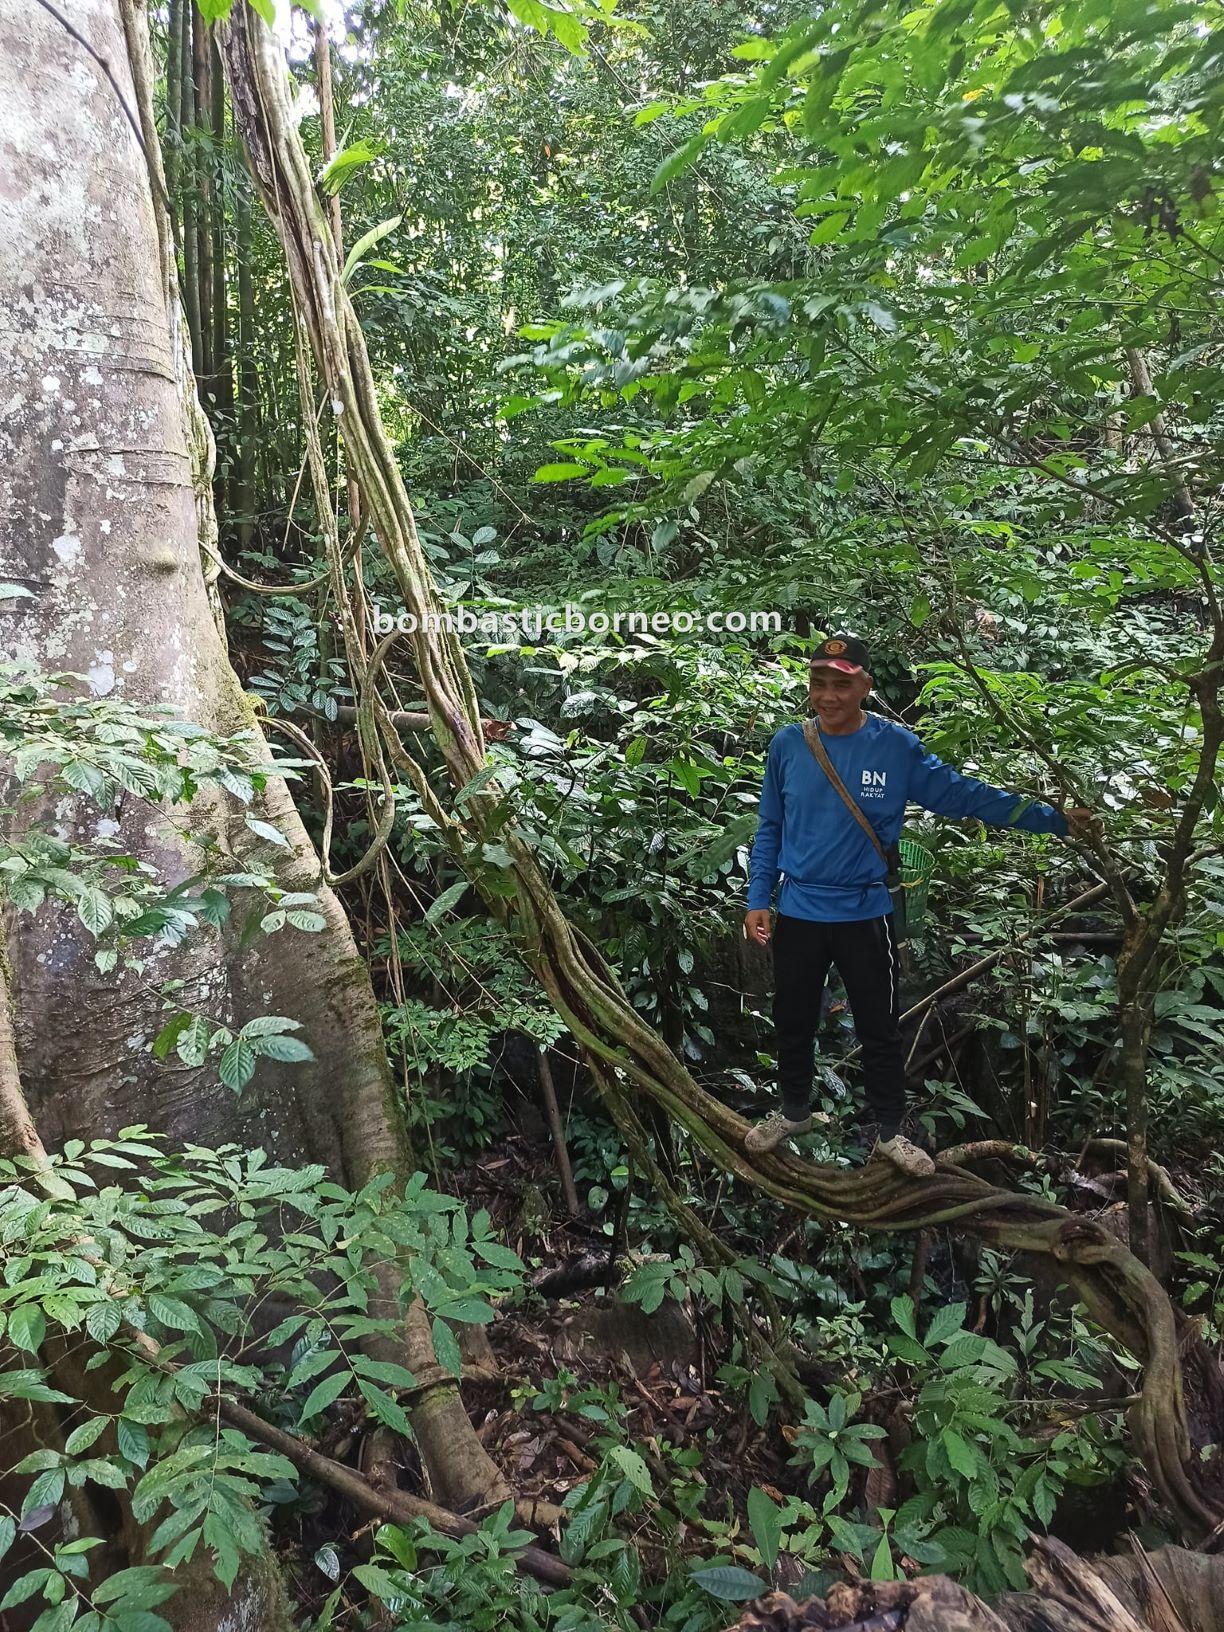 Bung Mawang, Kampung Gayu, Serumah village, adventure, nature, outdoor, hiking, Padawan, Tourism, travel local, Borneo, exploration, 马来西亚古晋, 砂拉越丛林徒步, 婆罗洲热带雨林